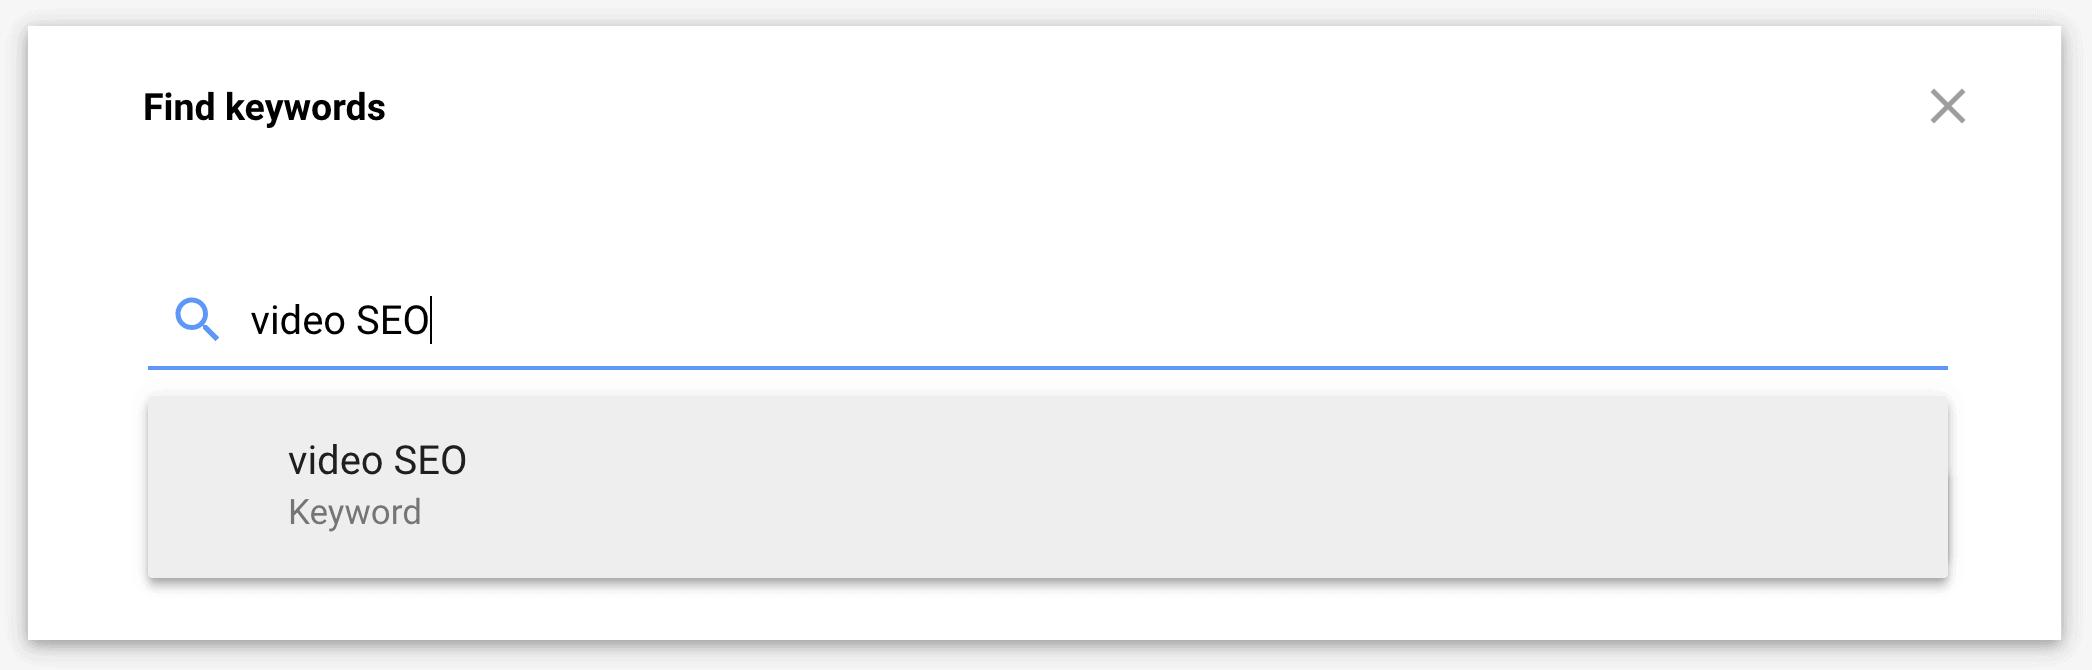 Google Keyword Planner – Enter phrase